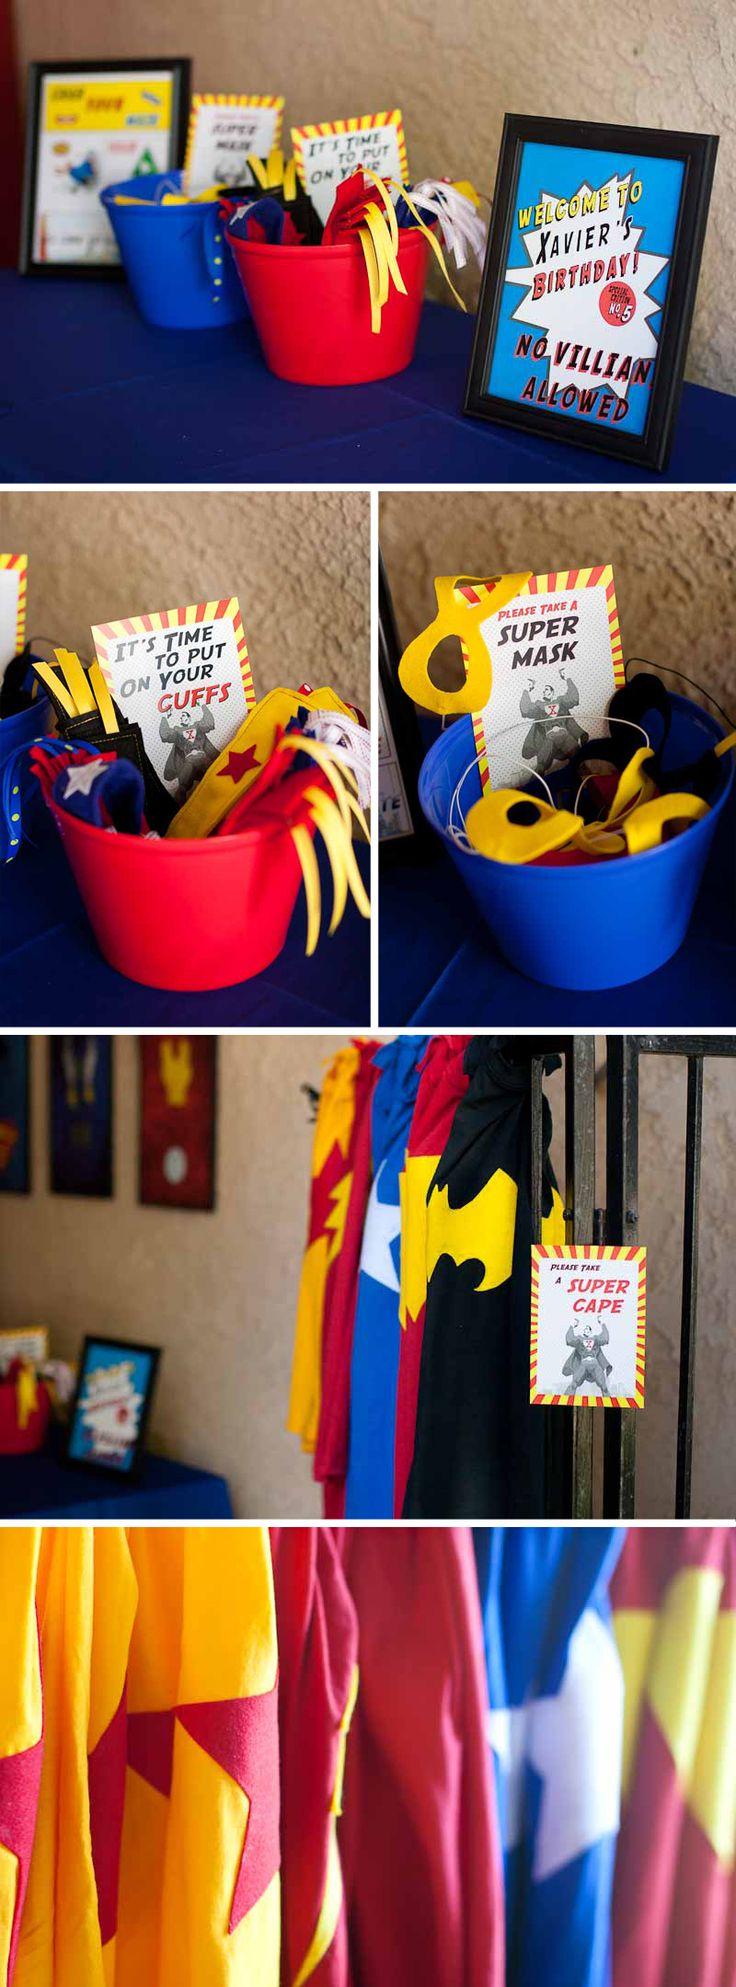 X-Man's Superhero 5th Birthday